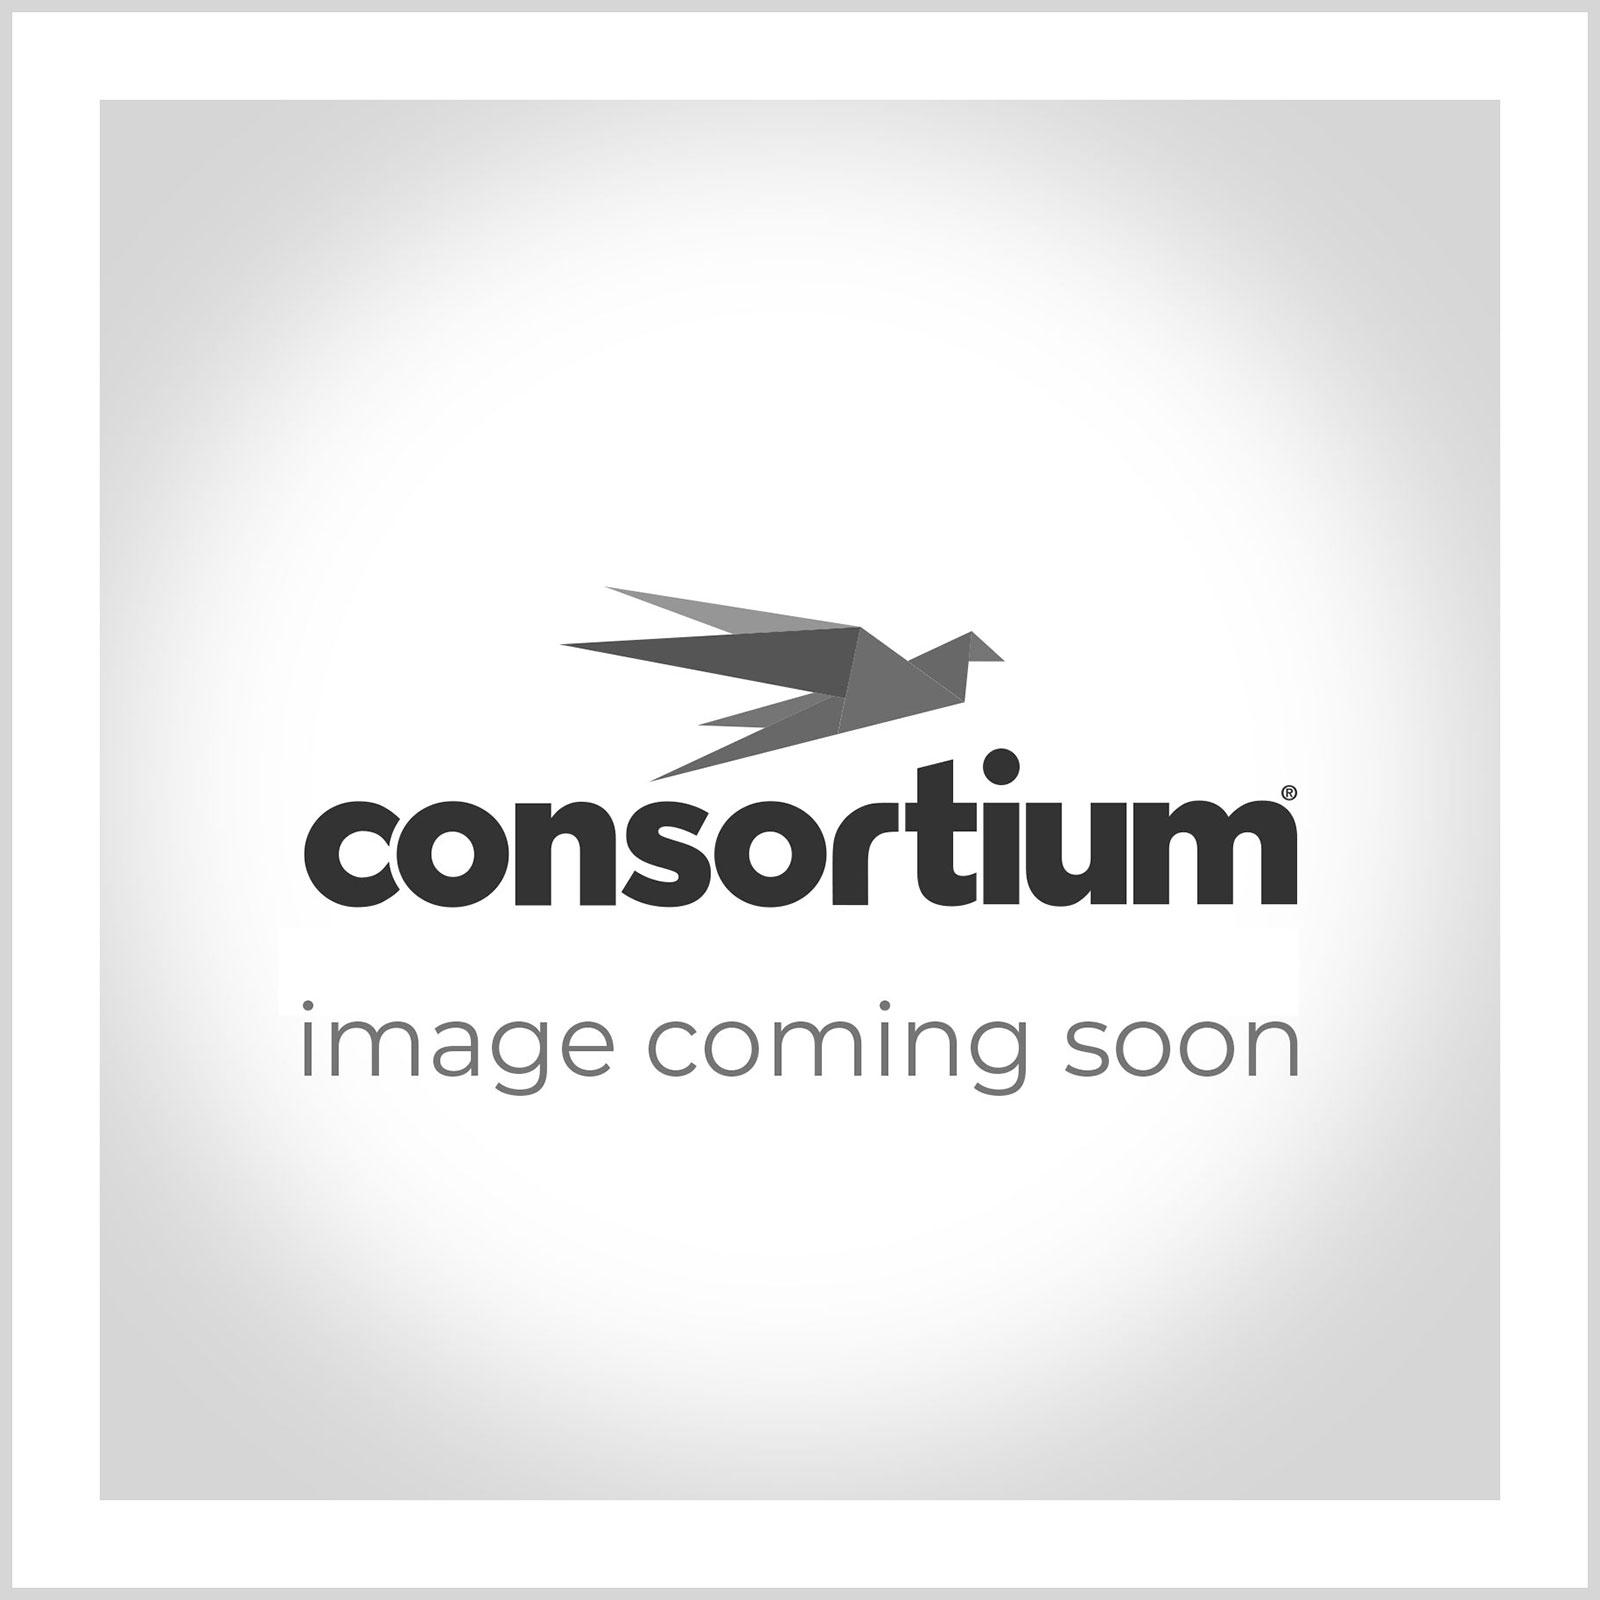 Consortium A4 Superlight Mini Whiteboards